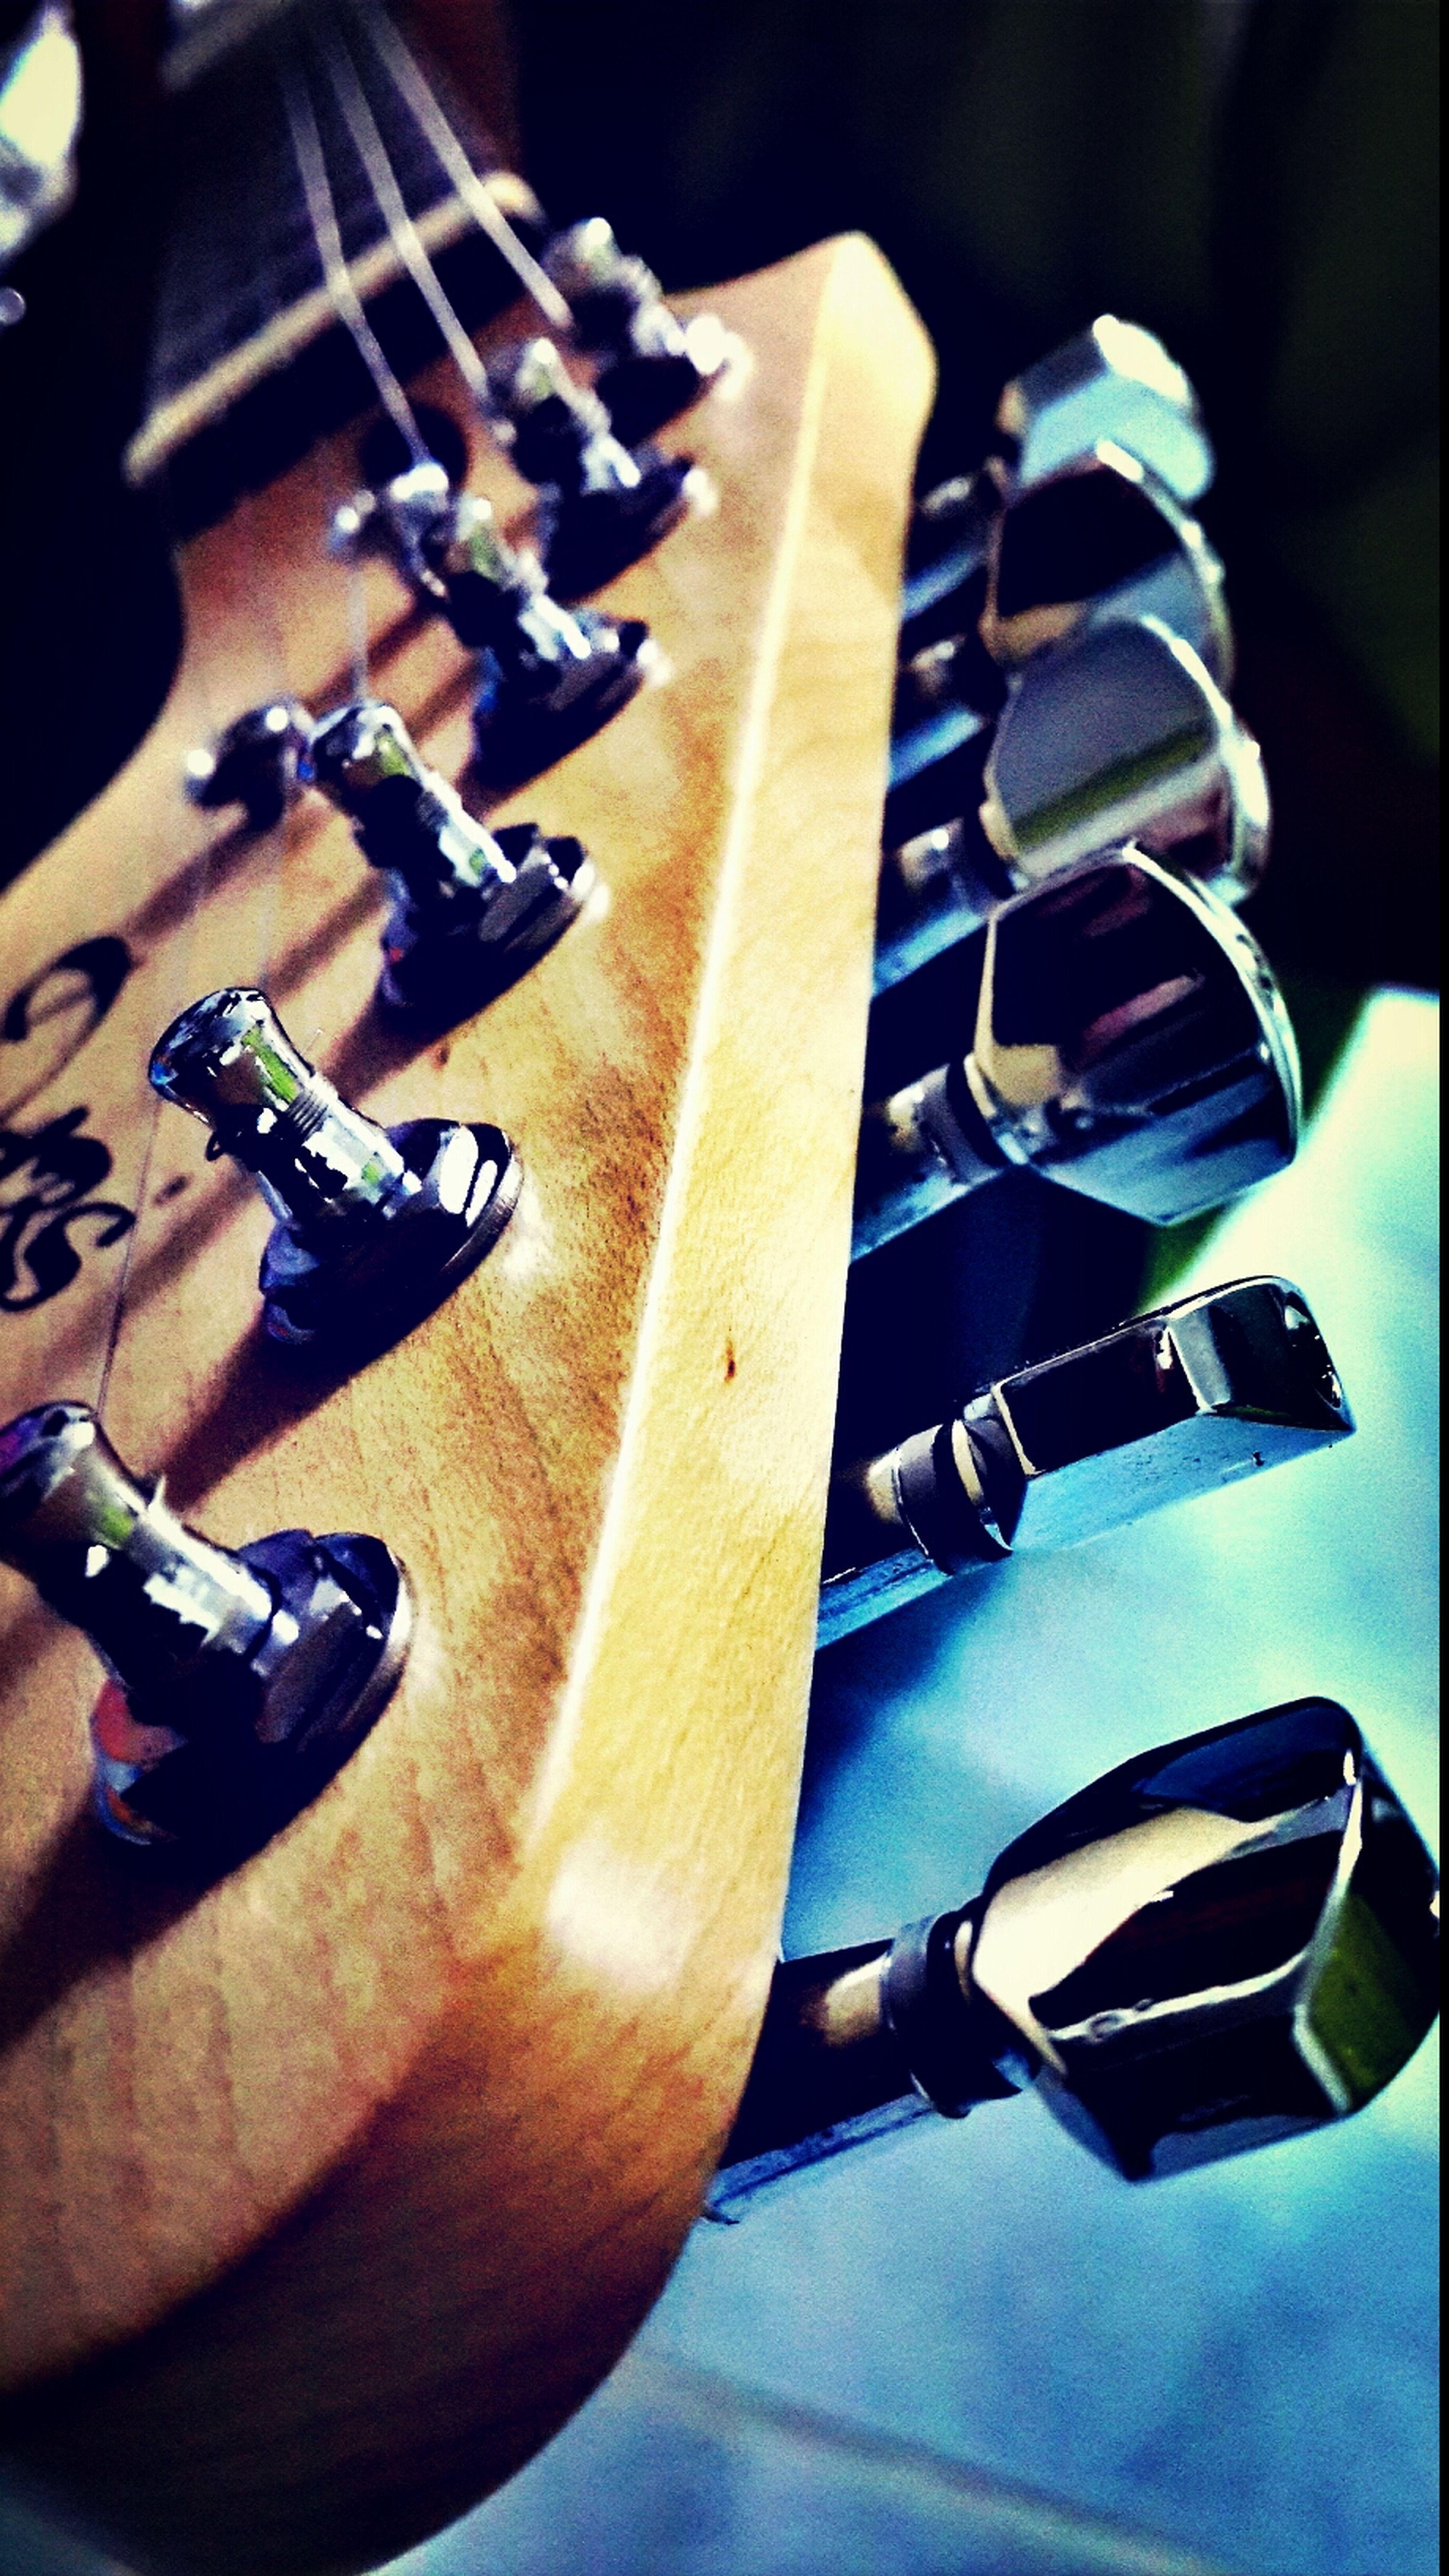 Guitar HDR Samsung Galaxy S4 my big bro guitar !!